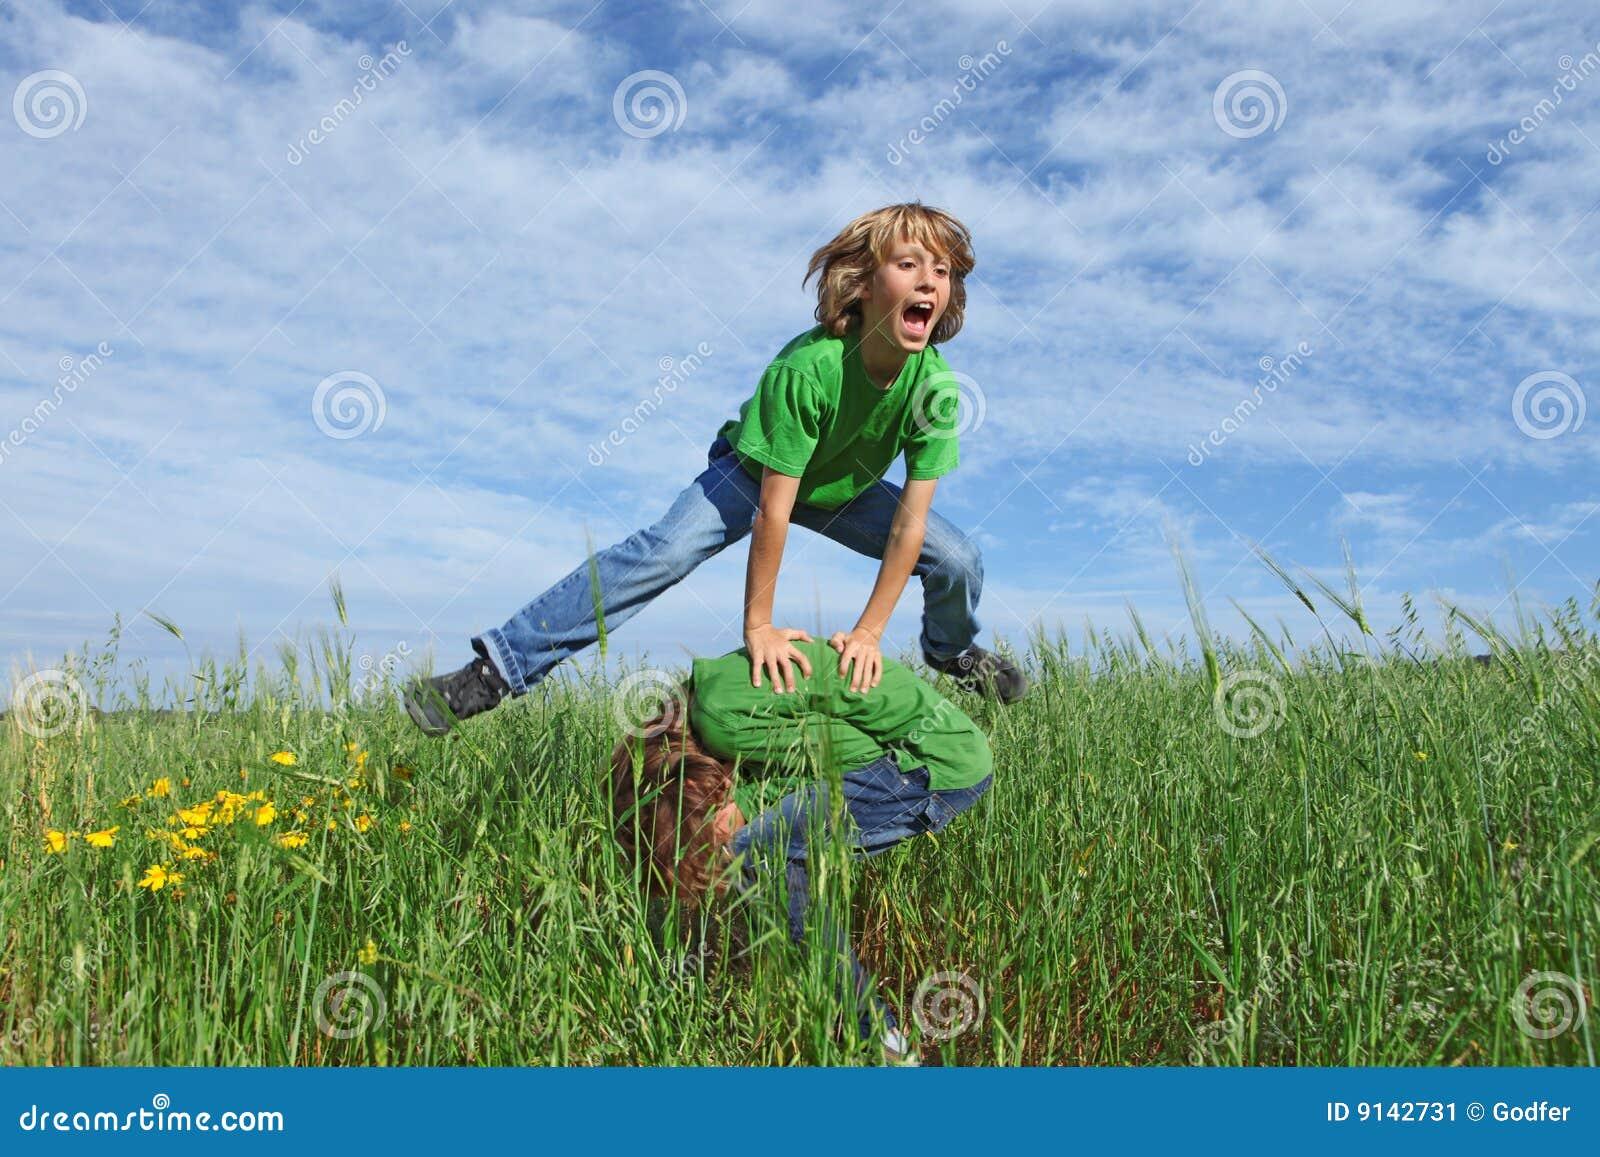 Leapfrog Active Kids Playing Stock Image